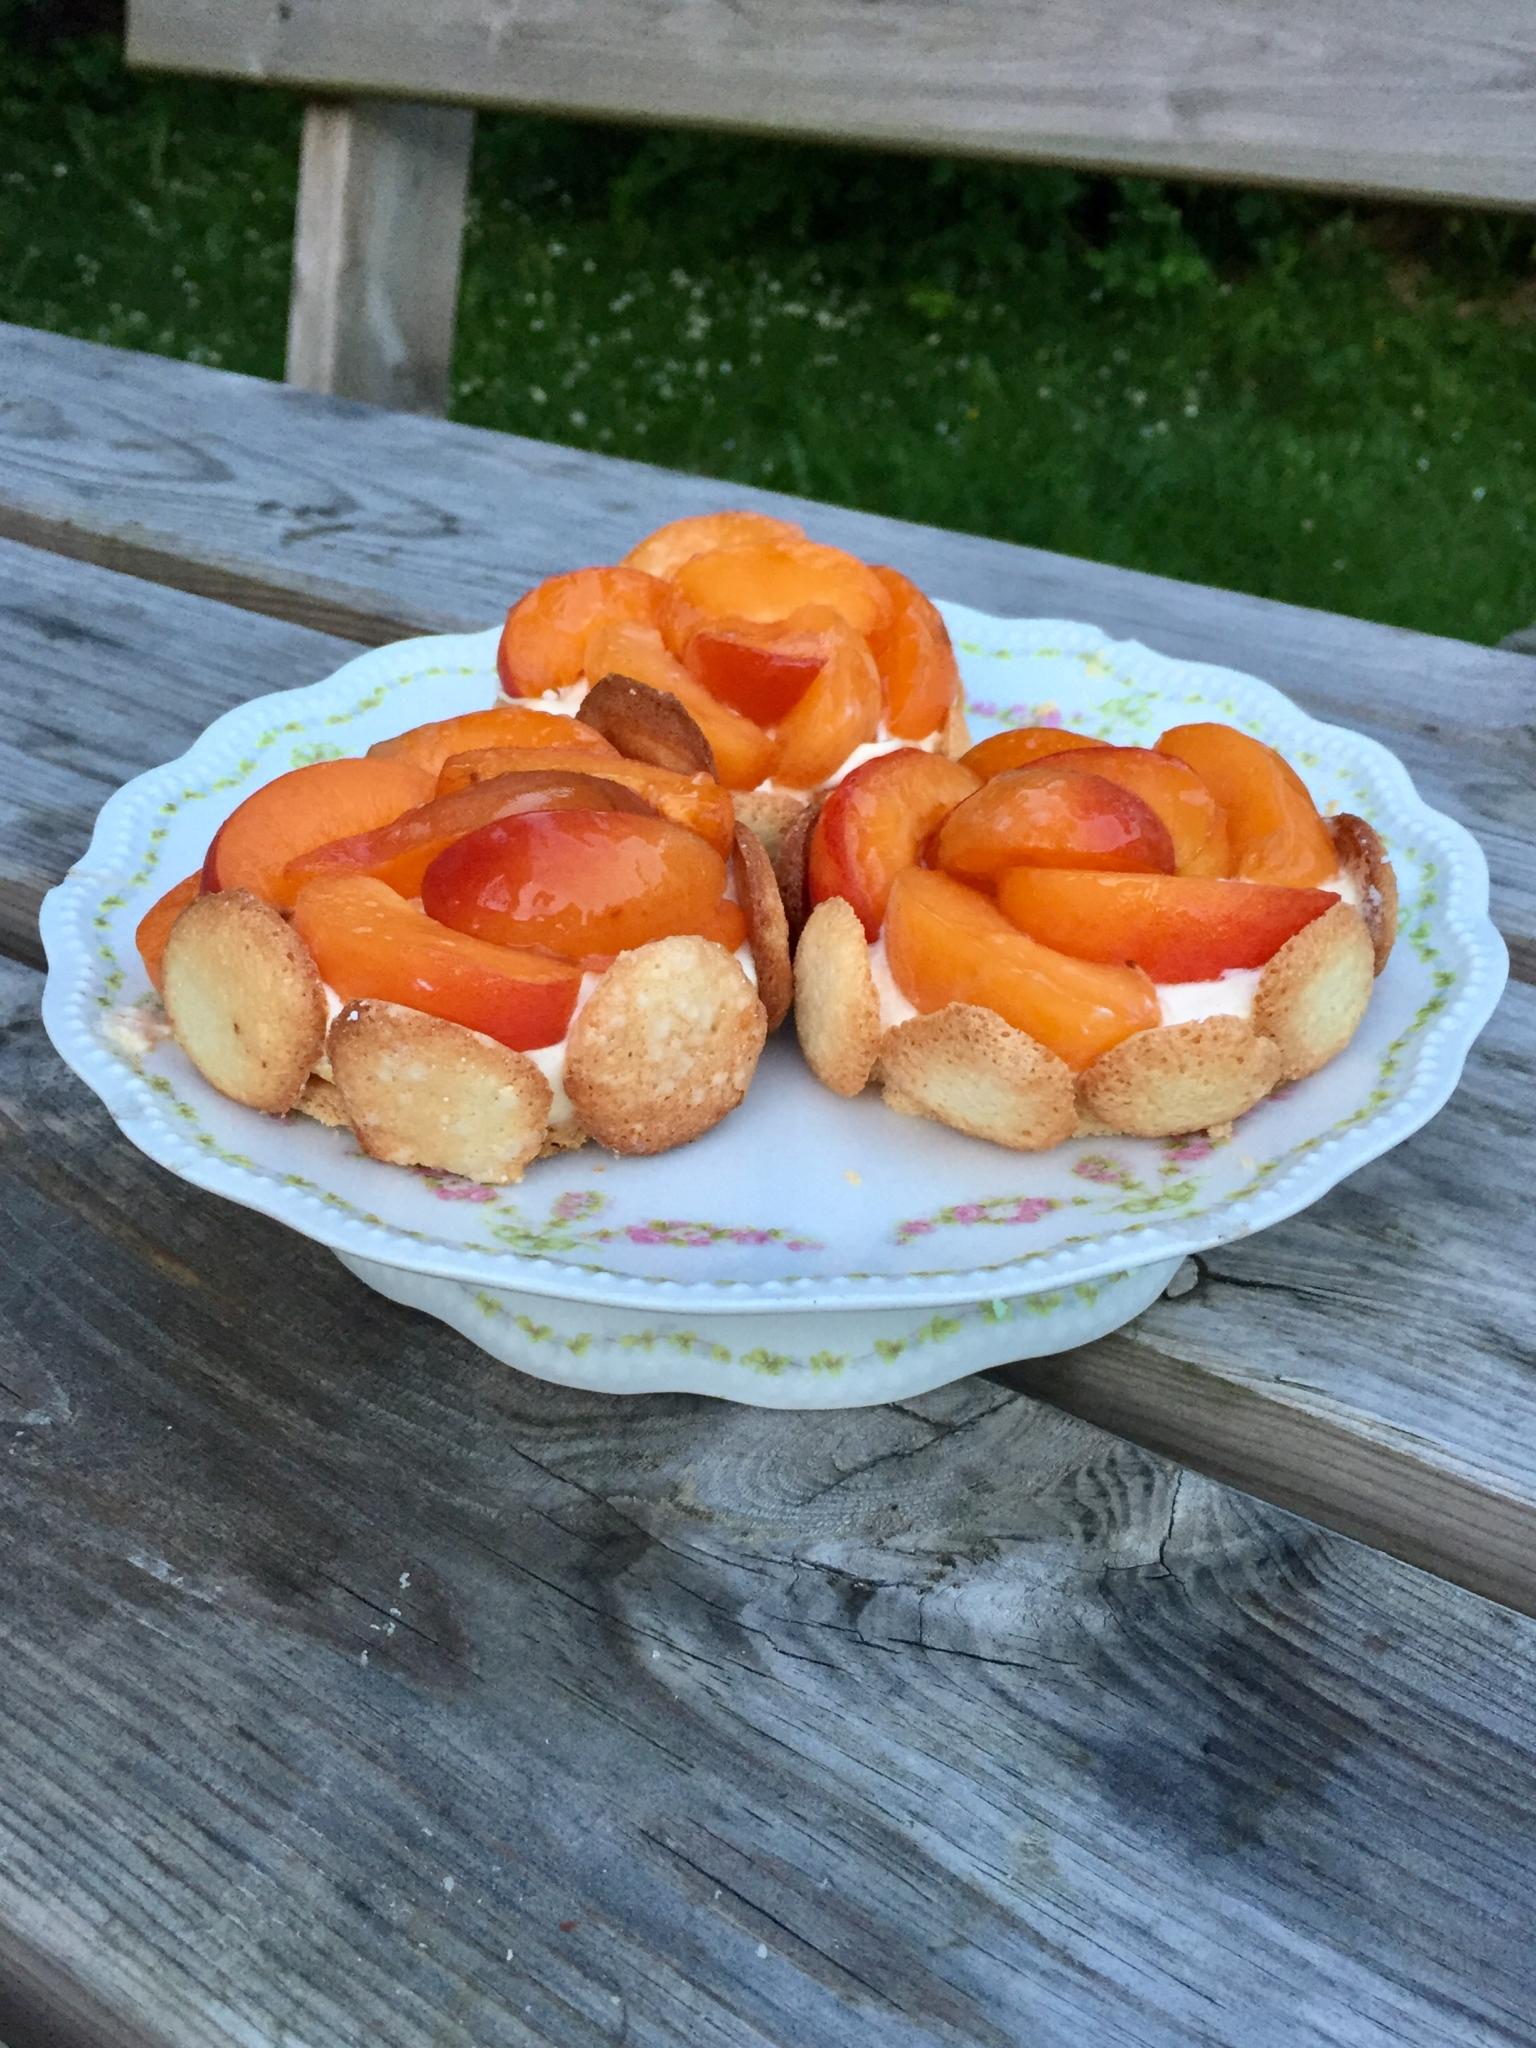 Tarte abricot amande de Jérôme de Oliveira adaptée sans gluten